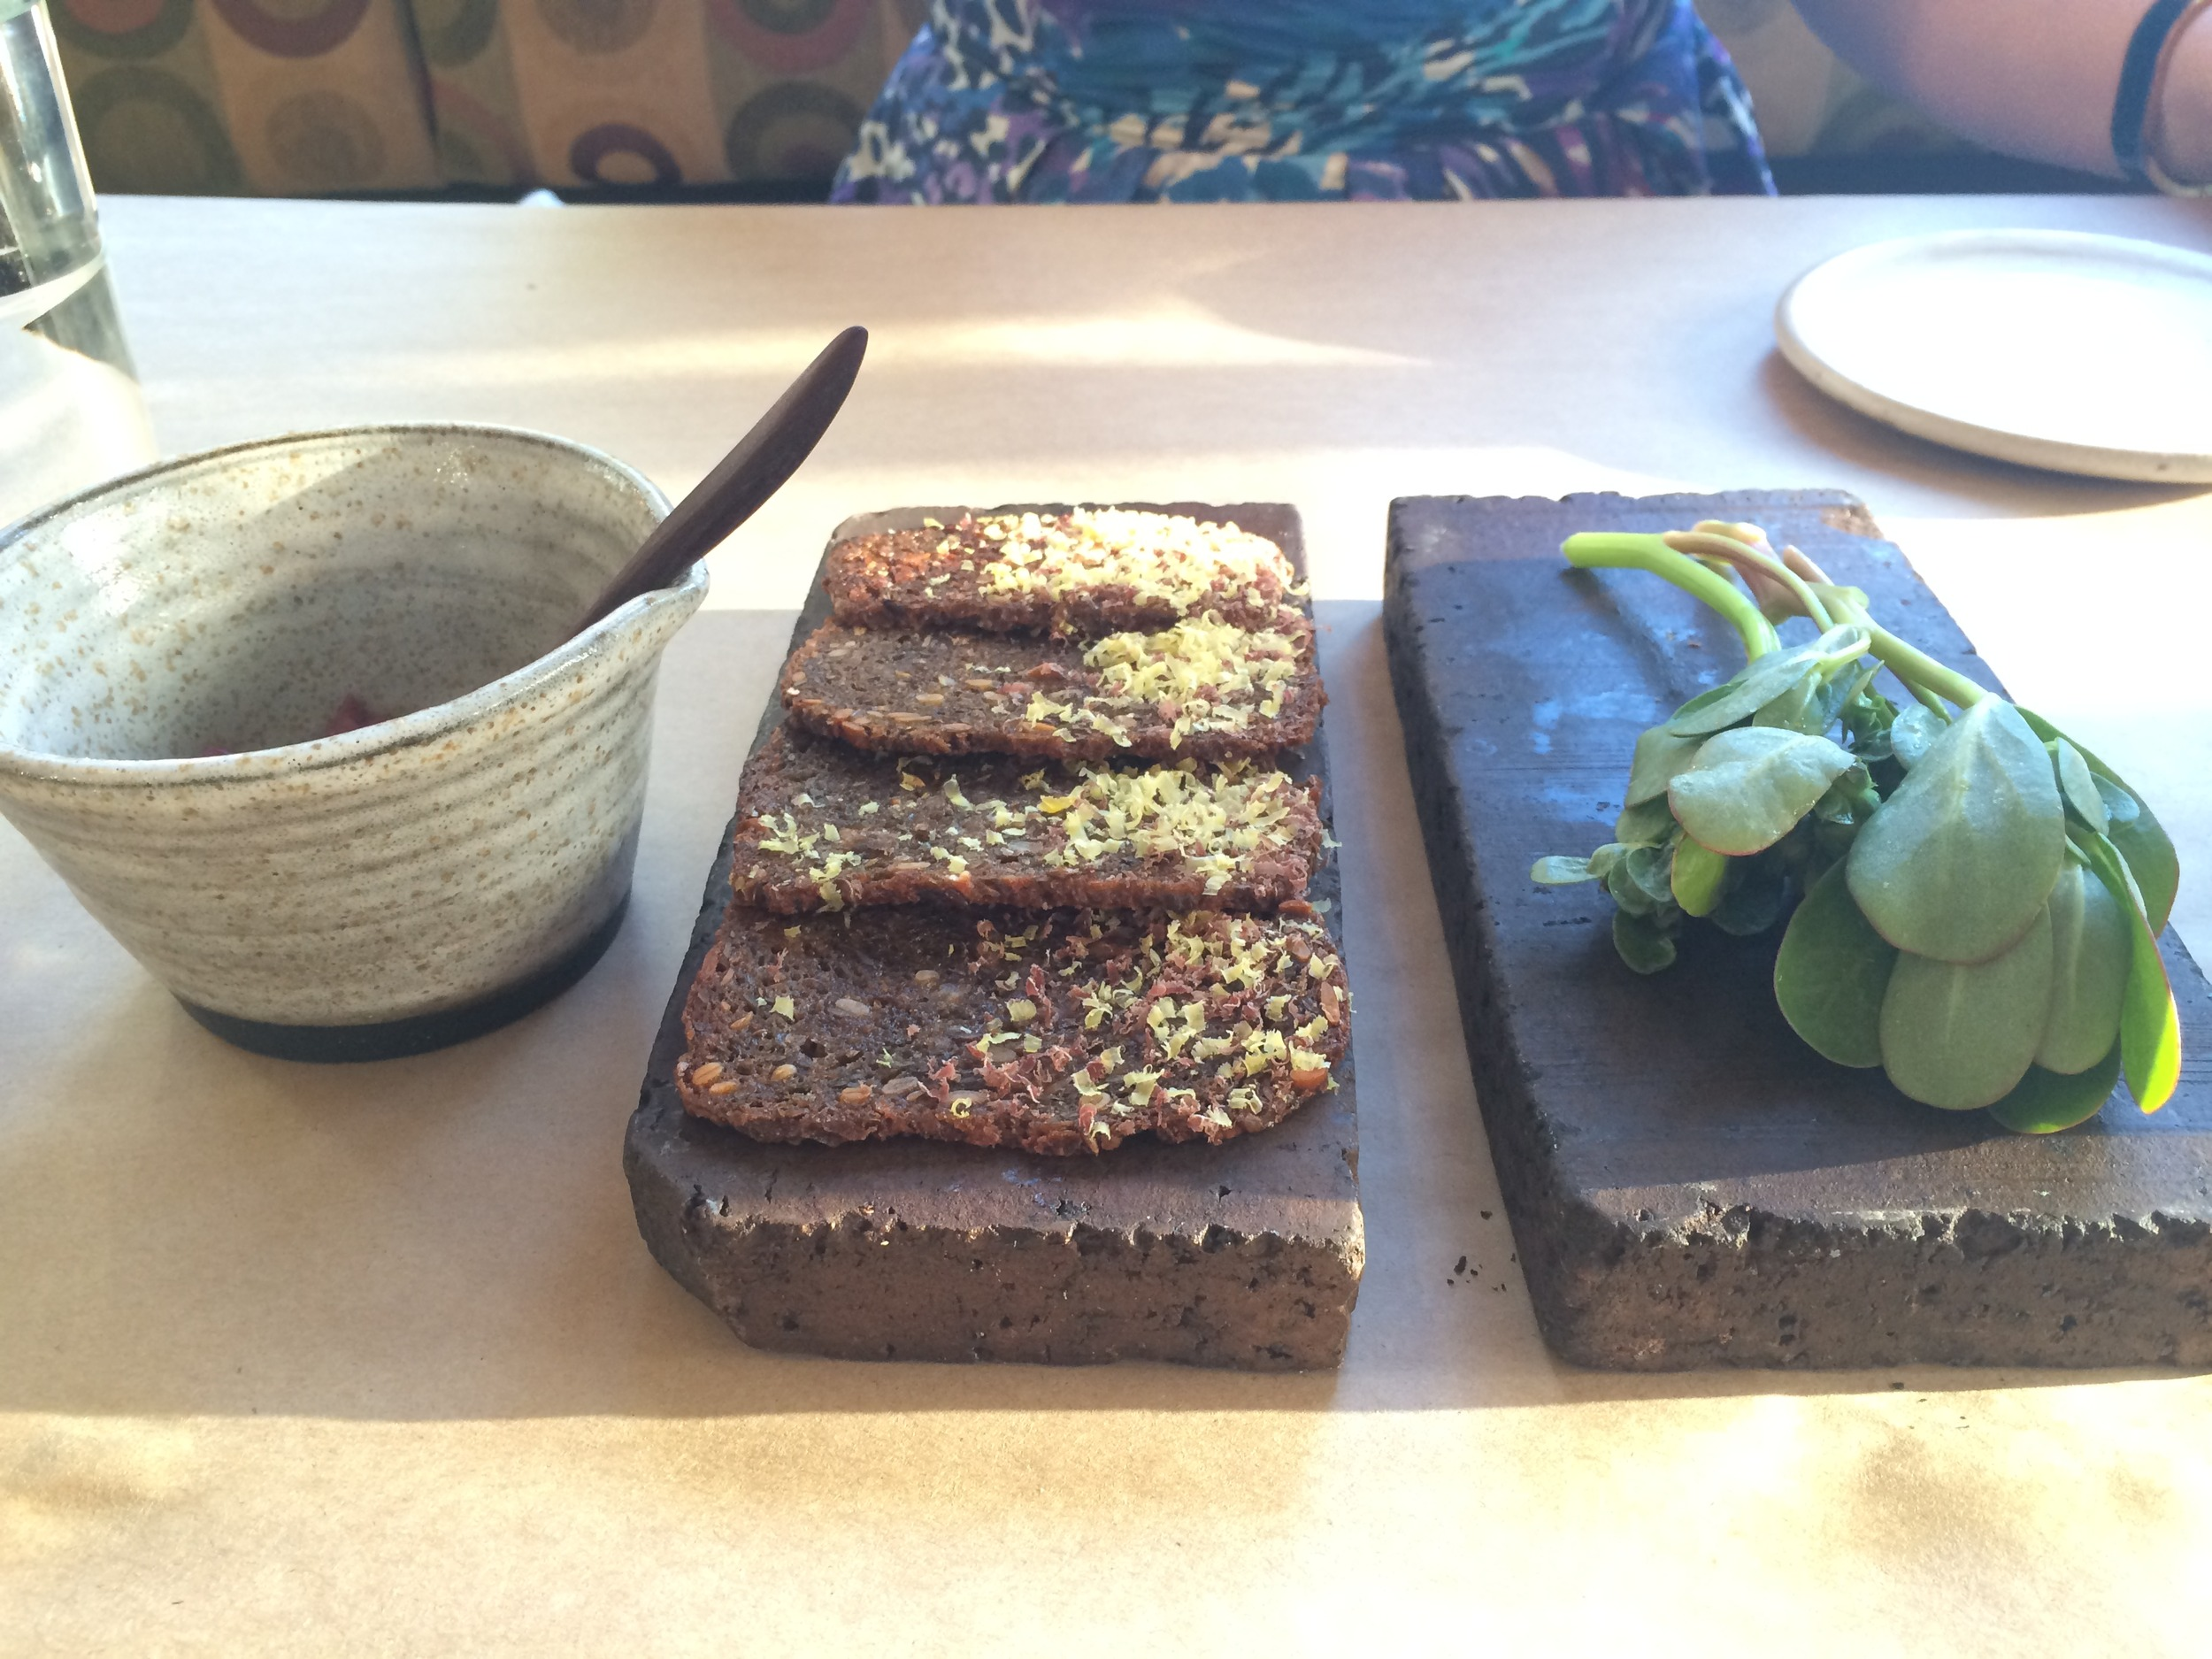 Aged venison, cracker and purslane.